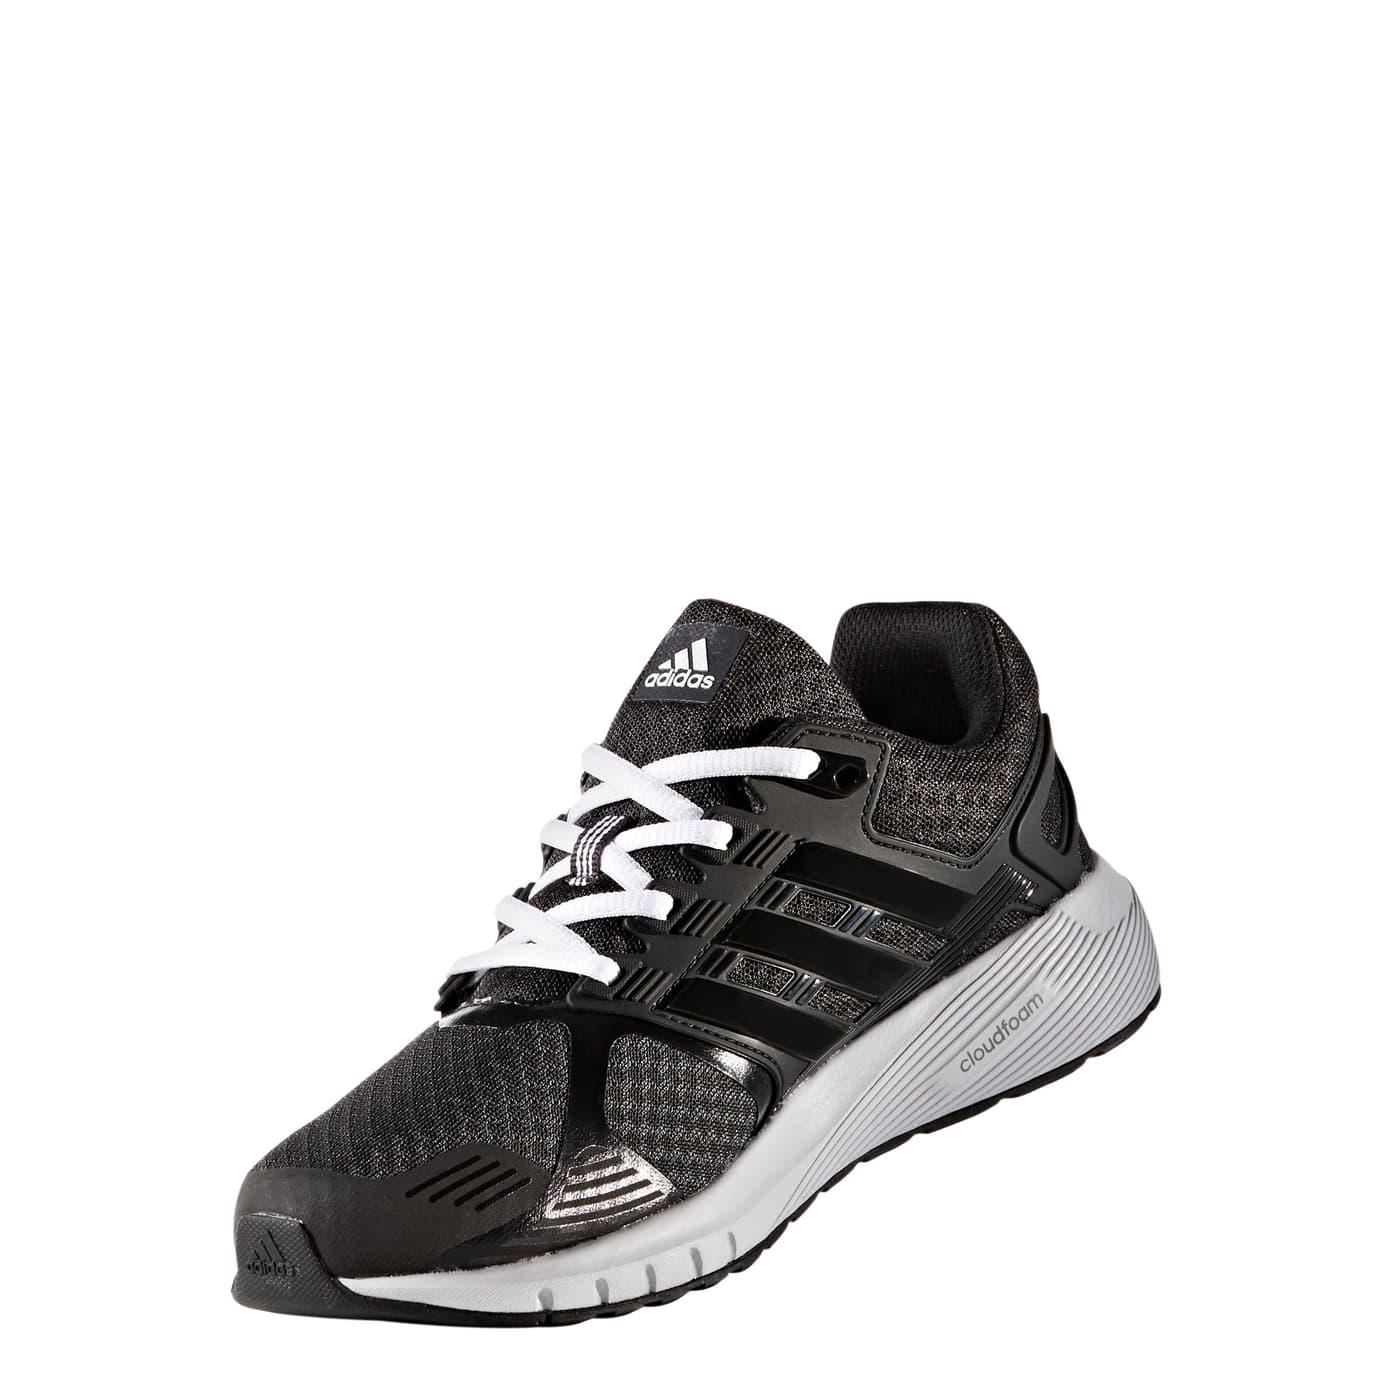 Adidas Duramo 8 Damen-Runningschuh